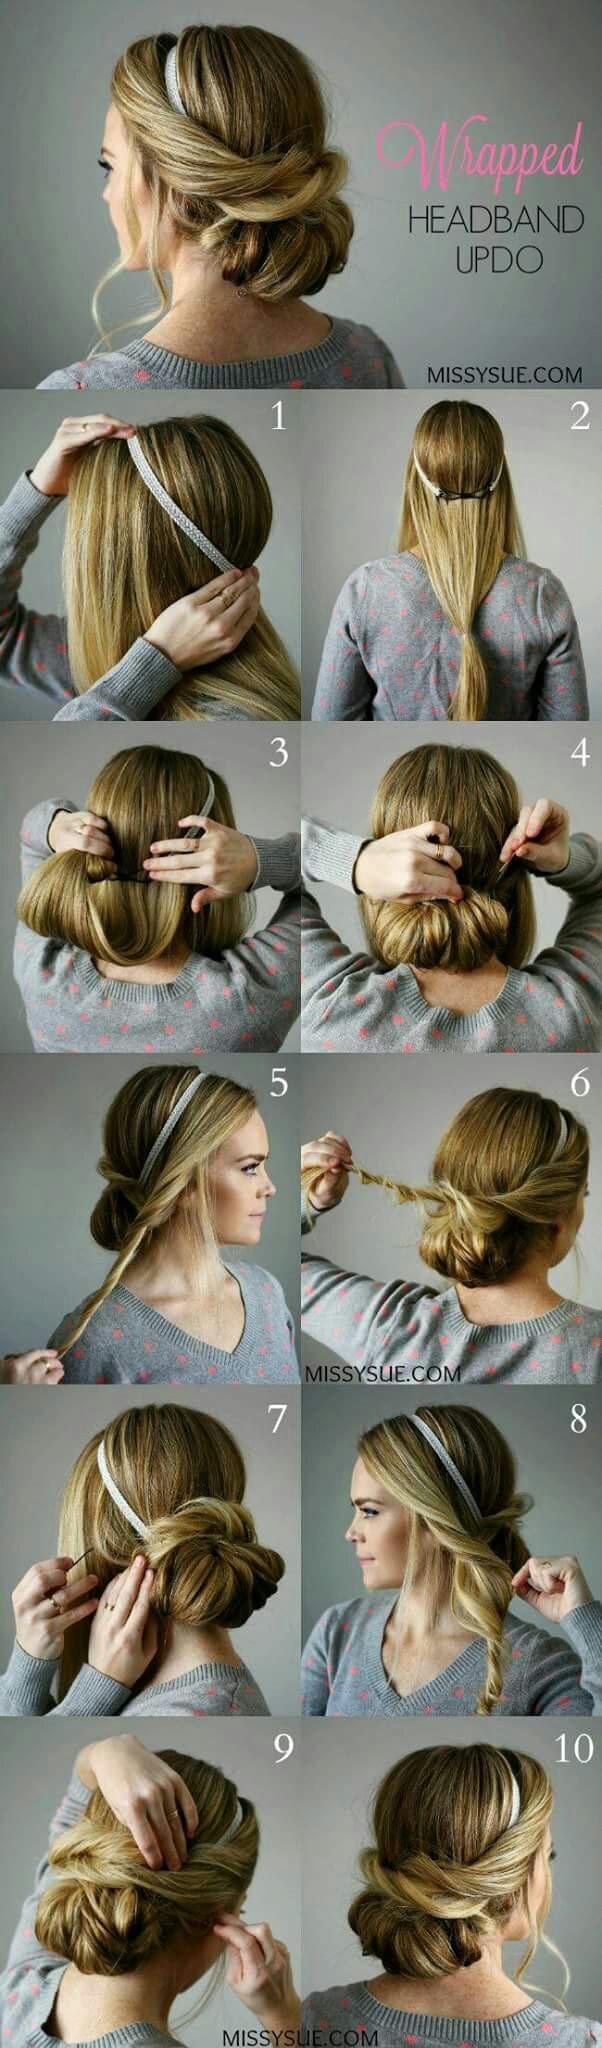 Pin by zainab yusuf on hair styles pinterest hair style